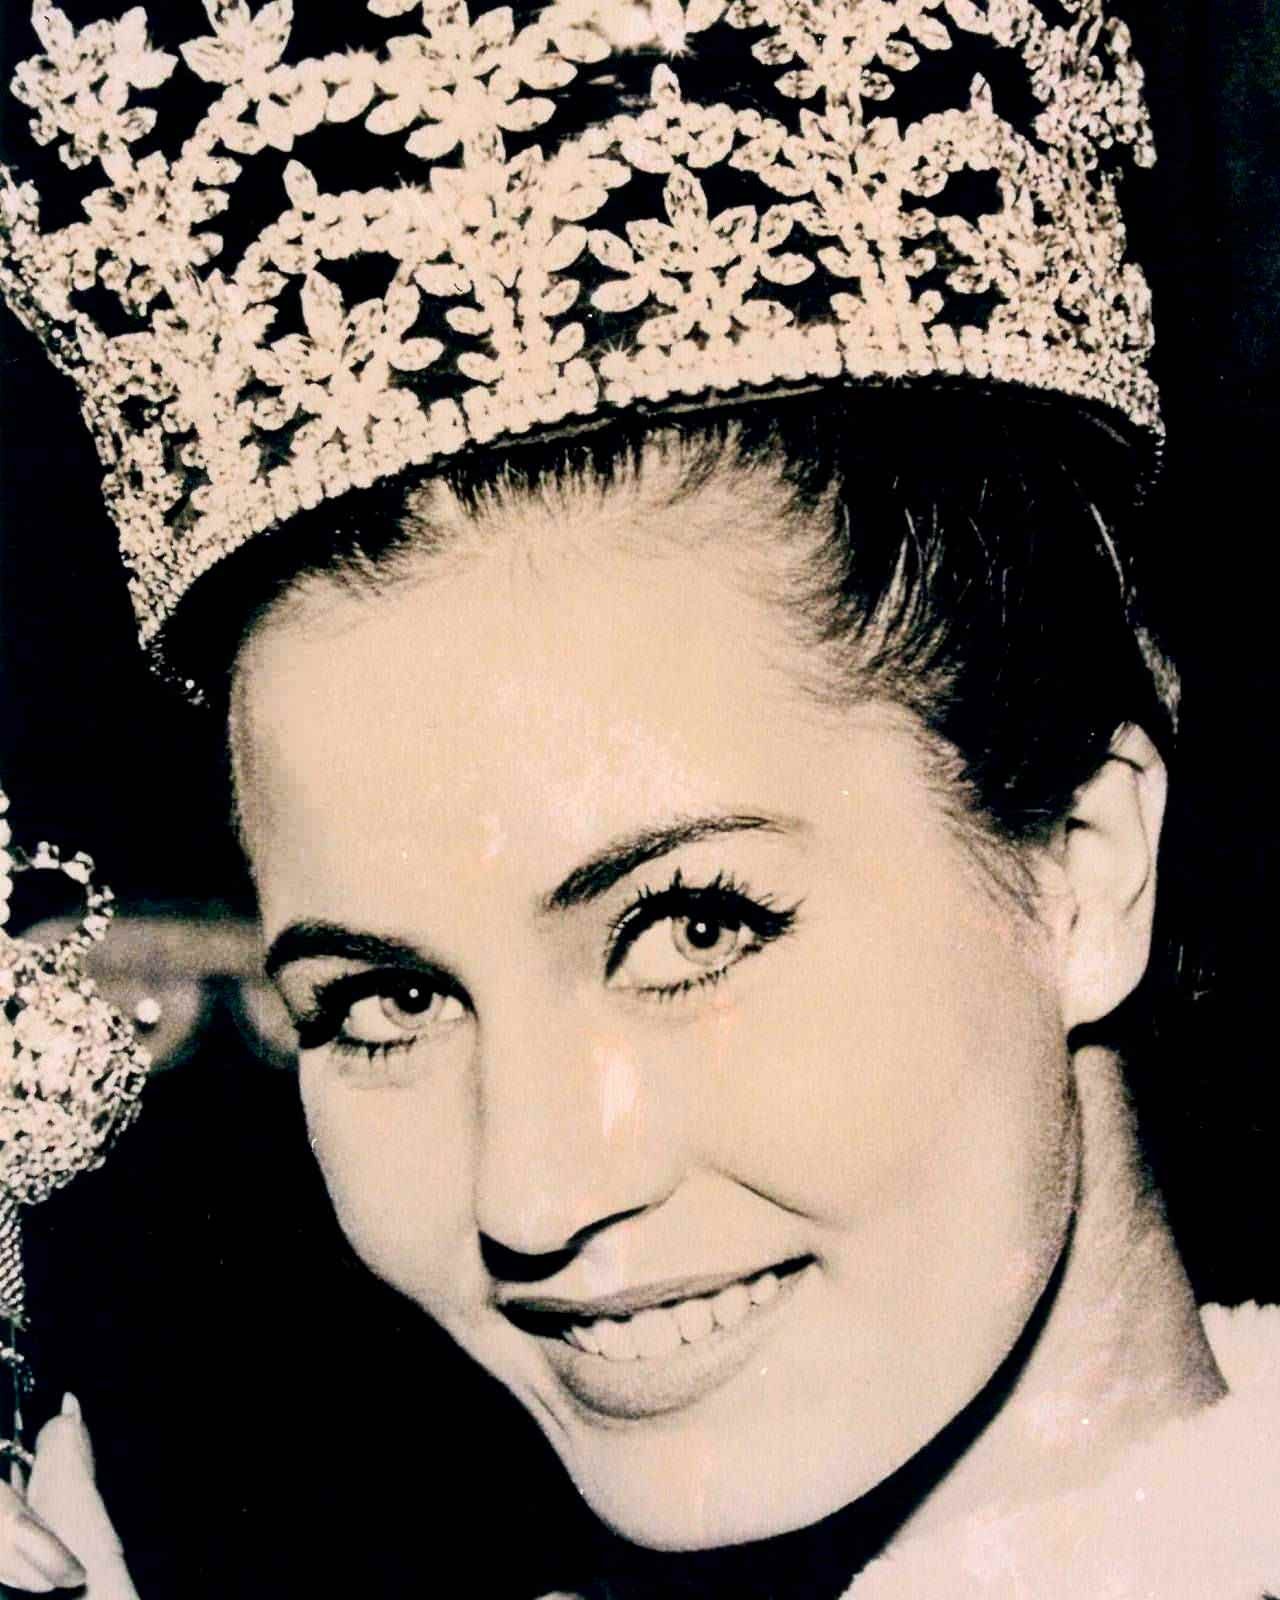 Фото | Мисс Мира 1962 года Катарина Лоддерс